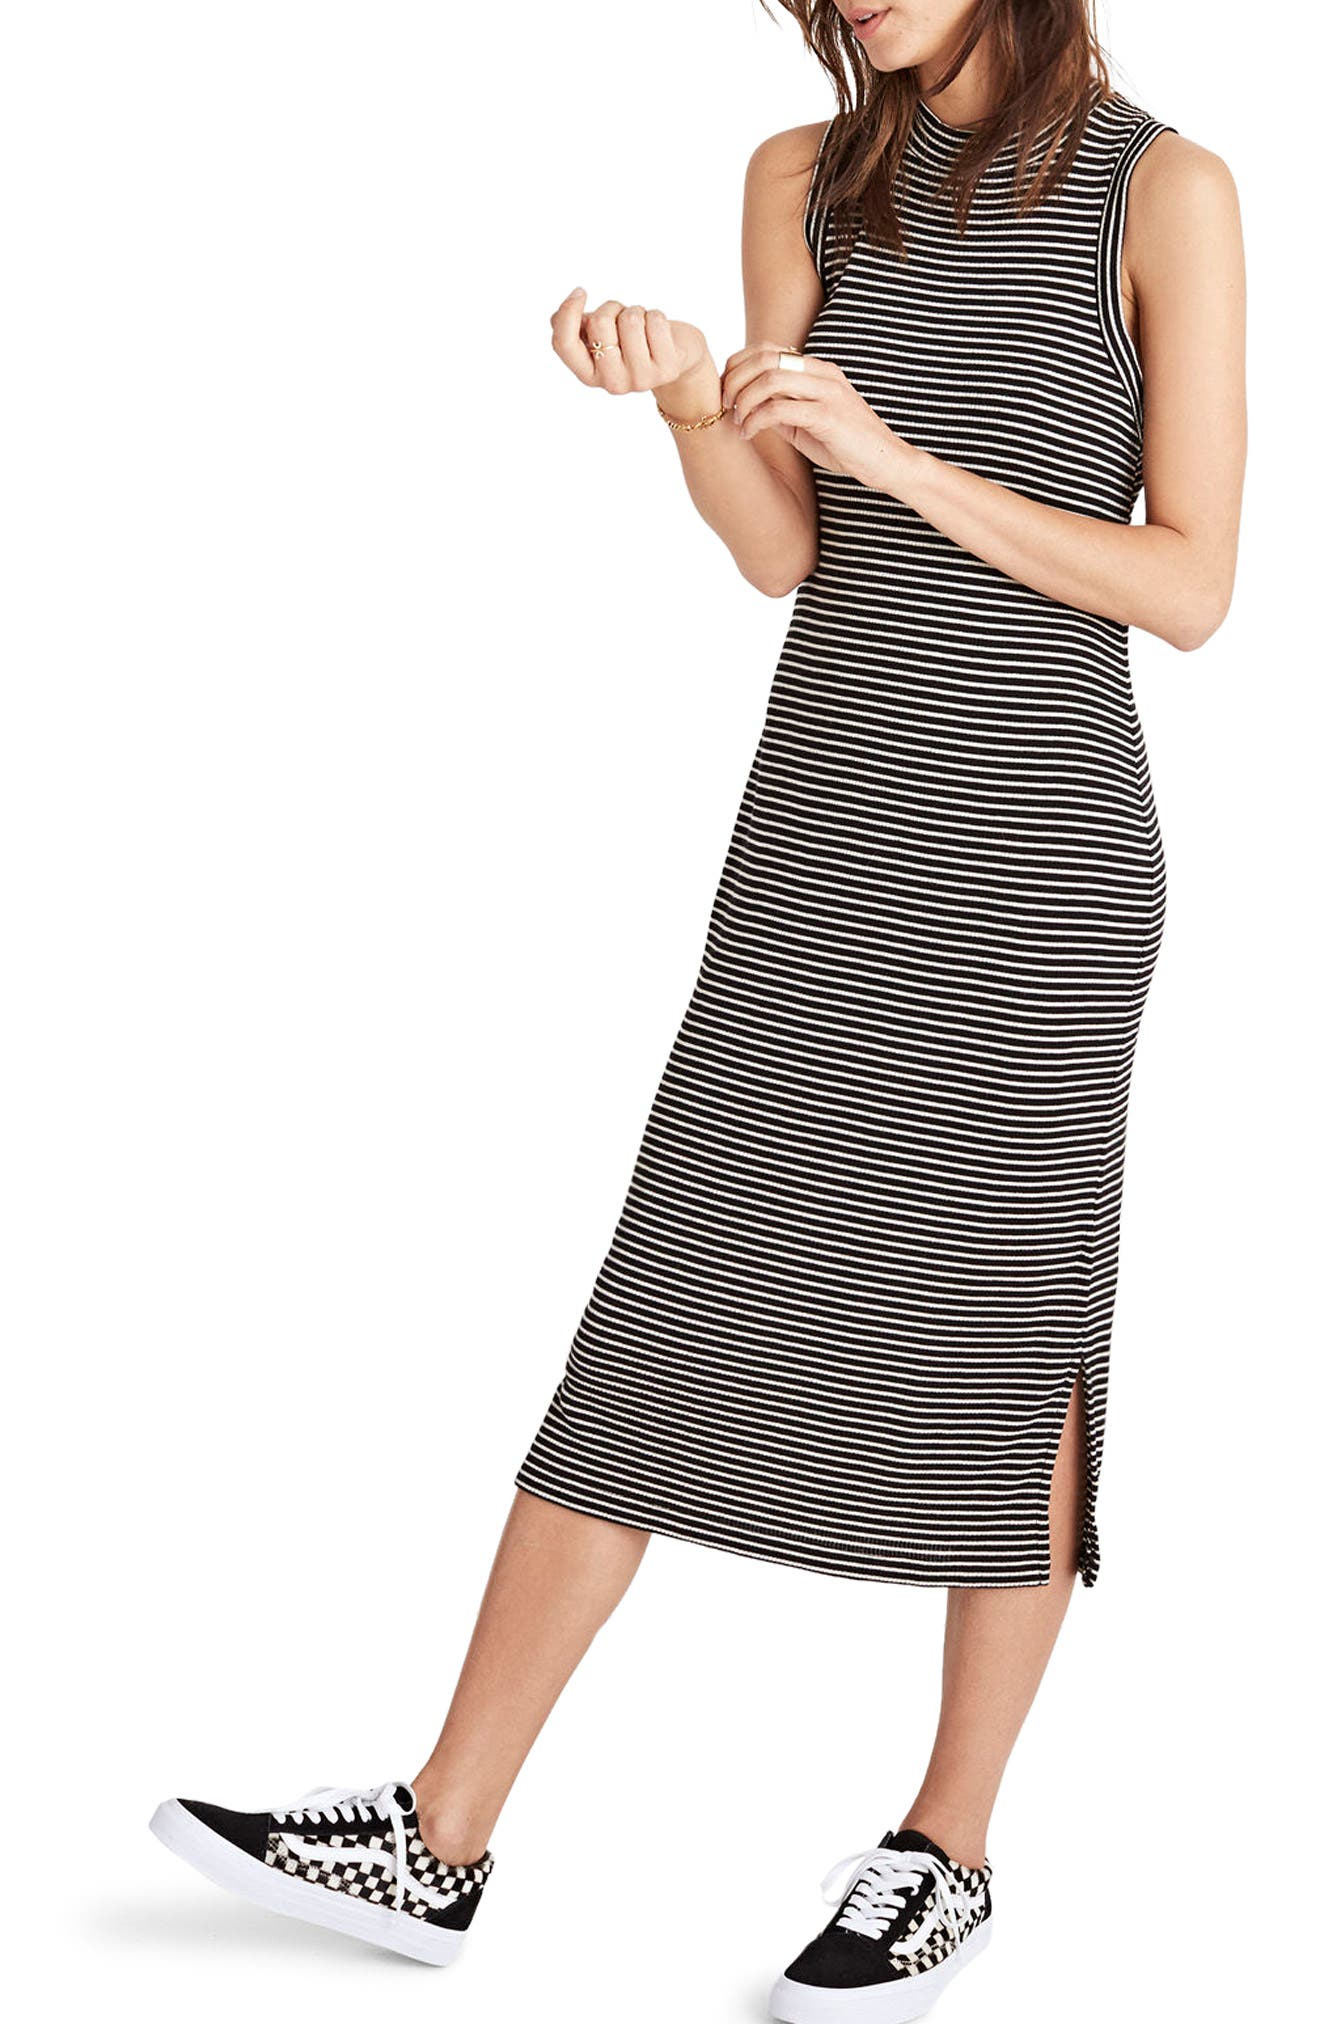 Ribbed Mock Neck Midi Dress,                             Main thumbnail 1, color,                             009